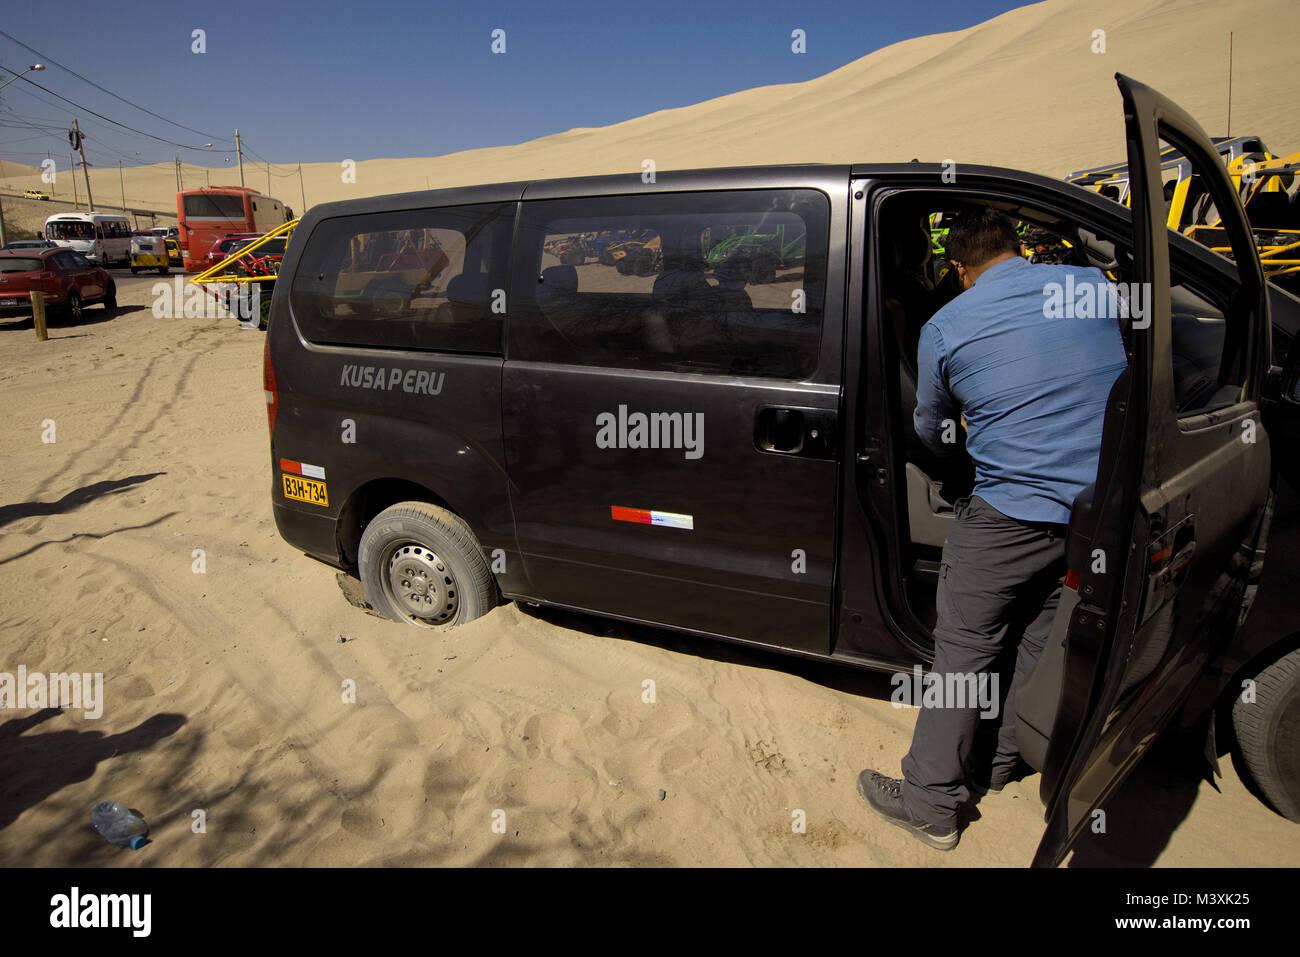 Minivan stuck in the sand, Ica Desert Peru - Stock Image